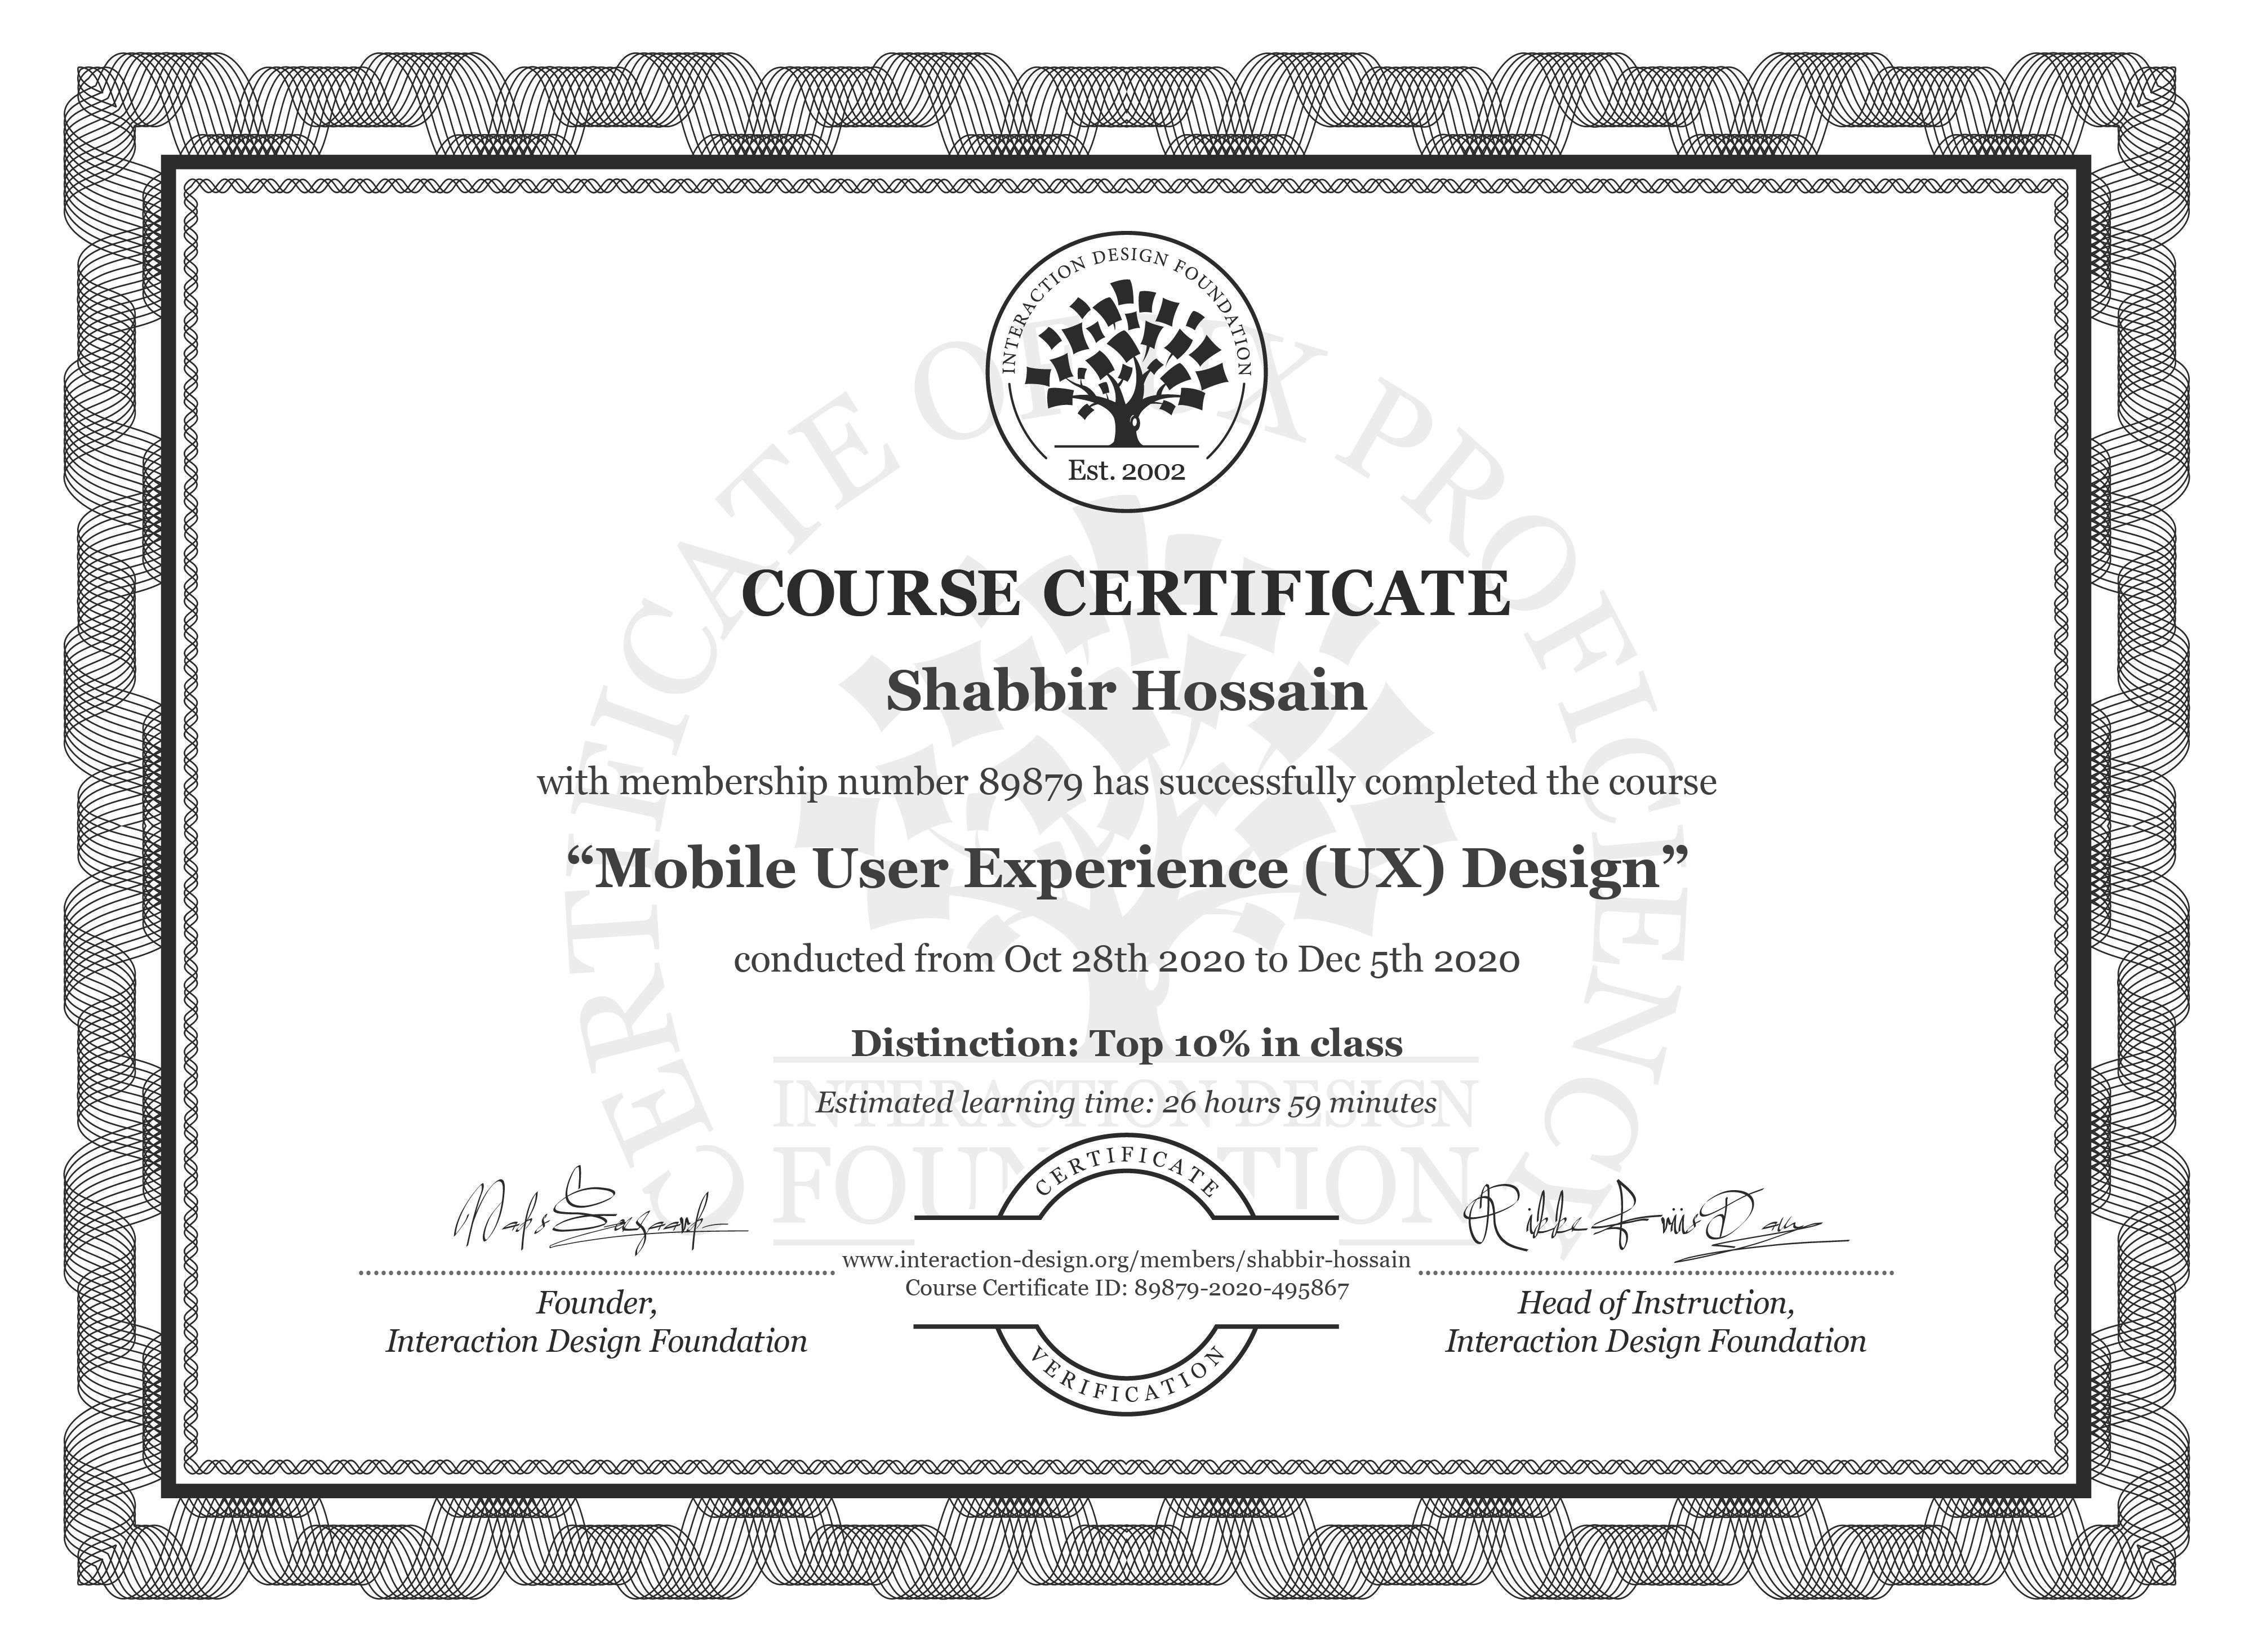 Shabbir Hossain's Course Certificate: Mobile User Experience (UX) Design